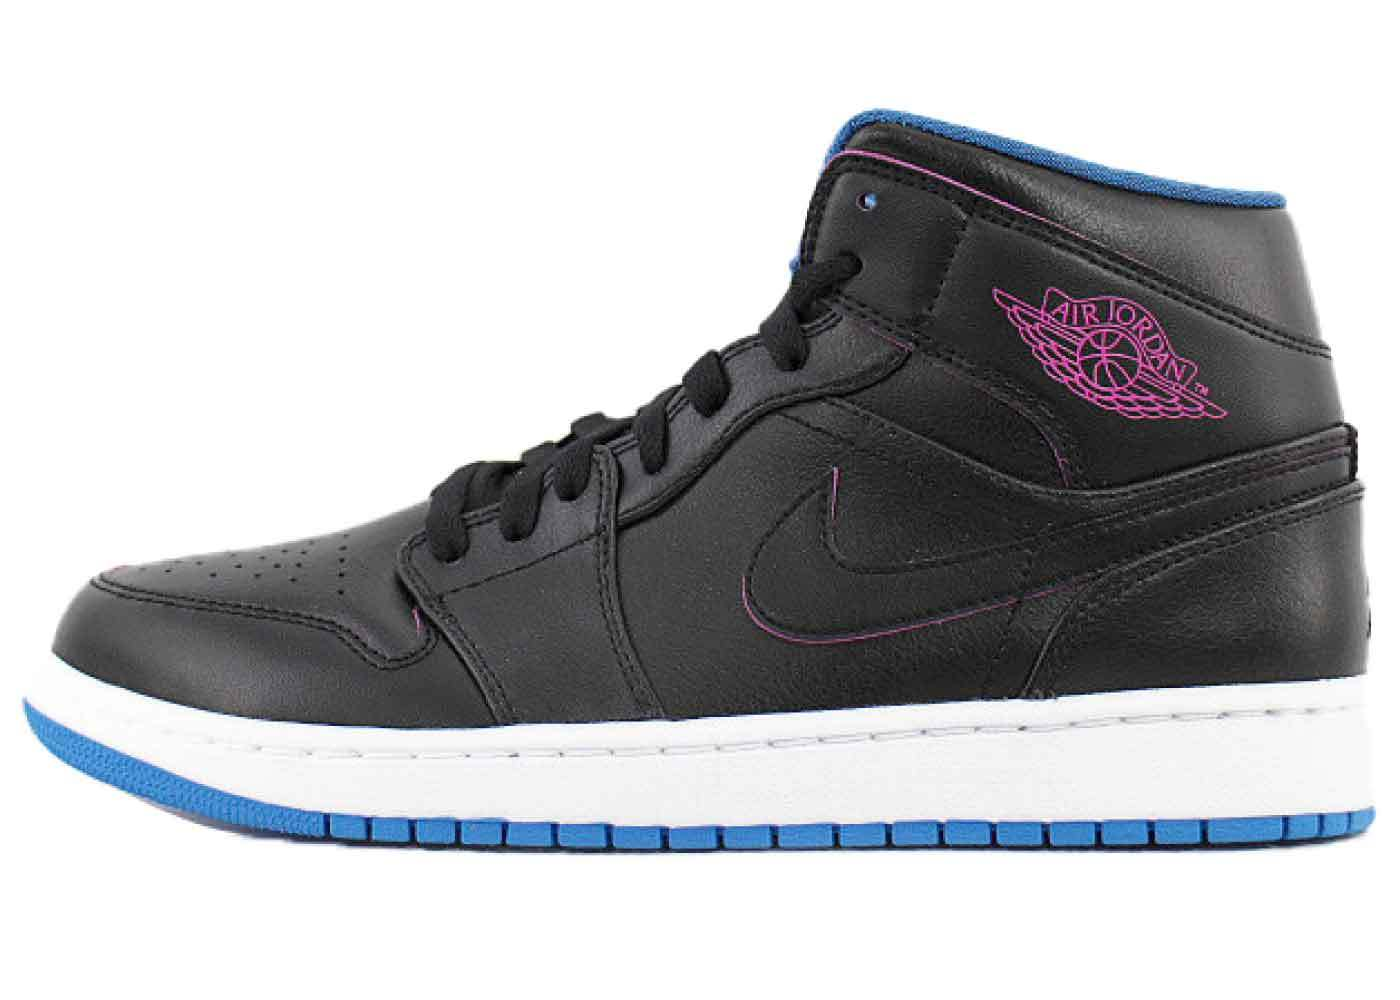 Nike Air Jordan 1 Retro Mid Radio Raheemの写真